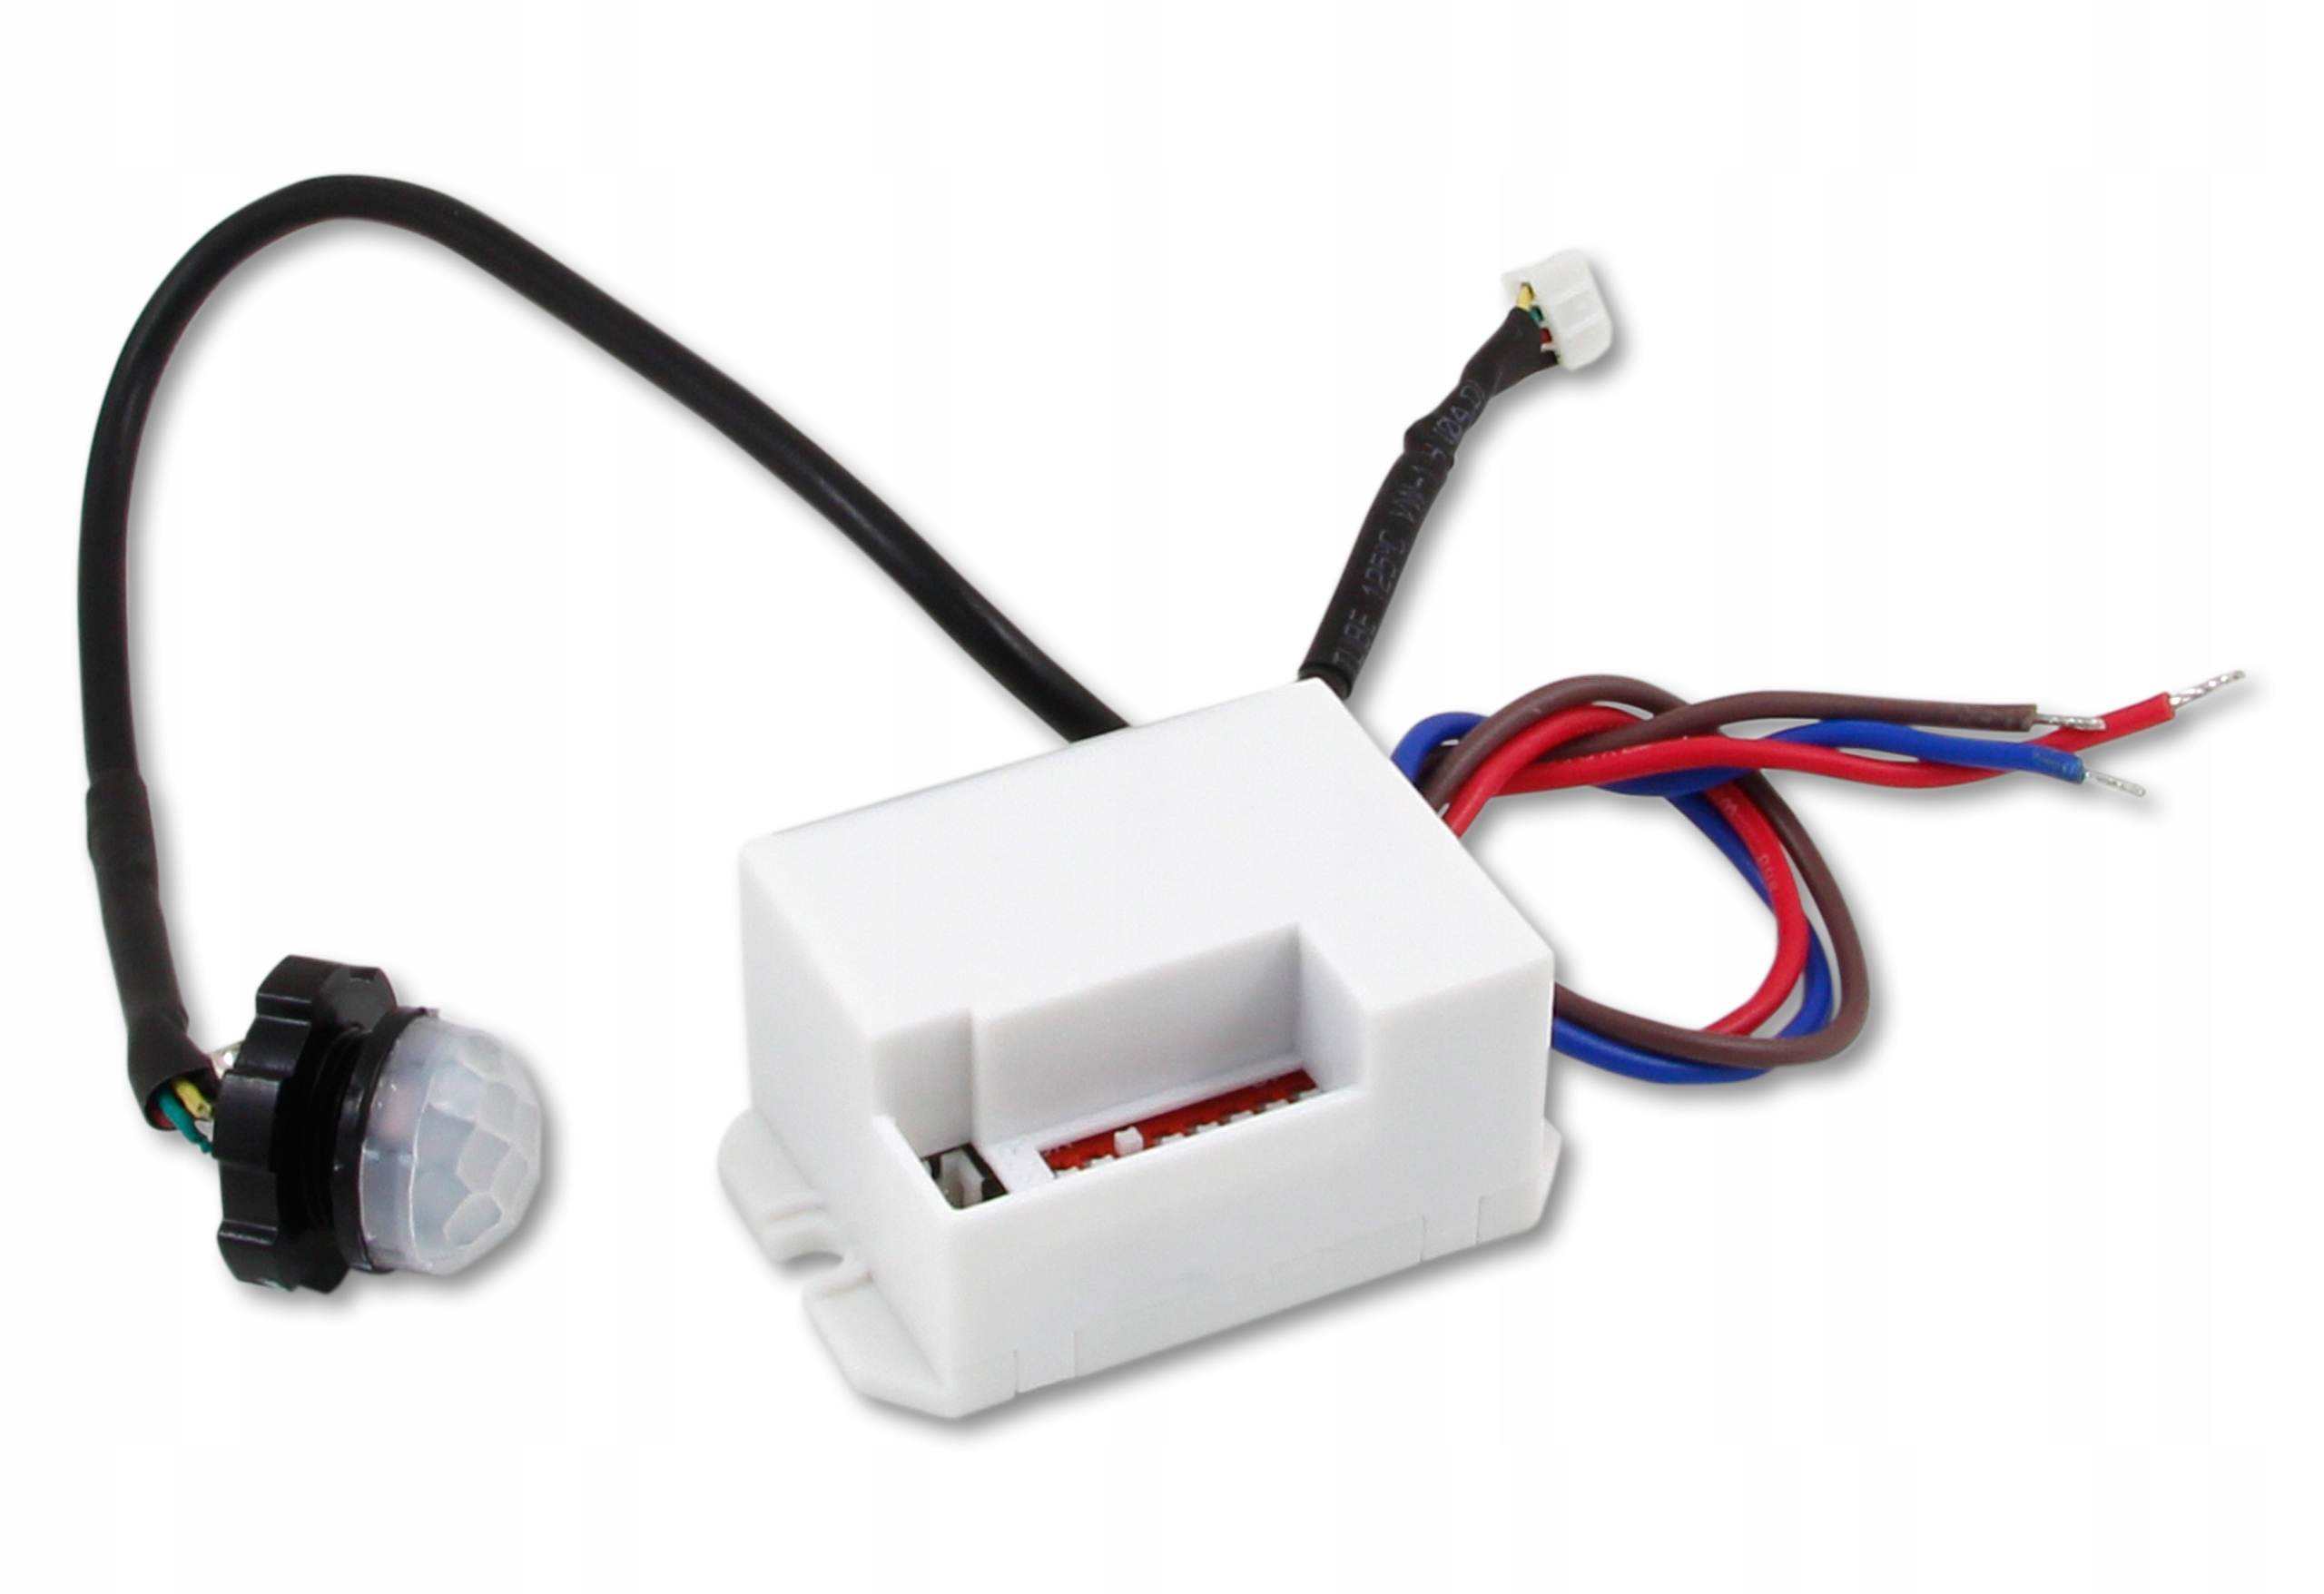 Czujnik RUCHU zmierzchu LED sensor mini sonda PIR